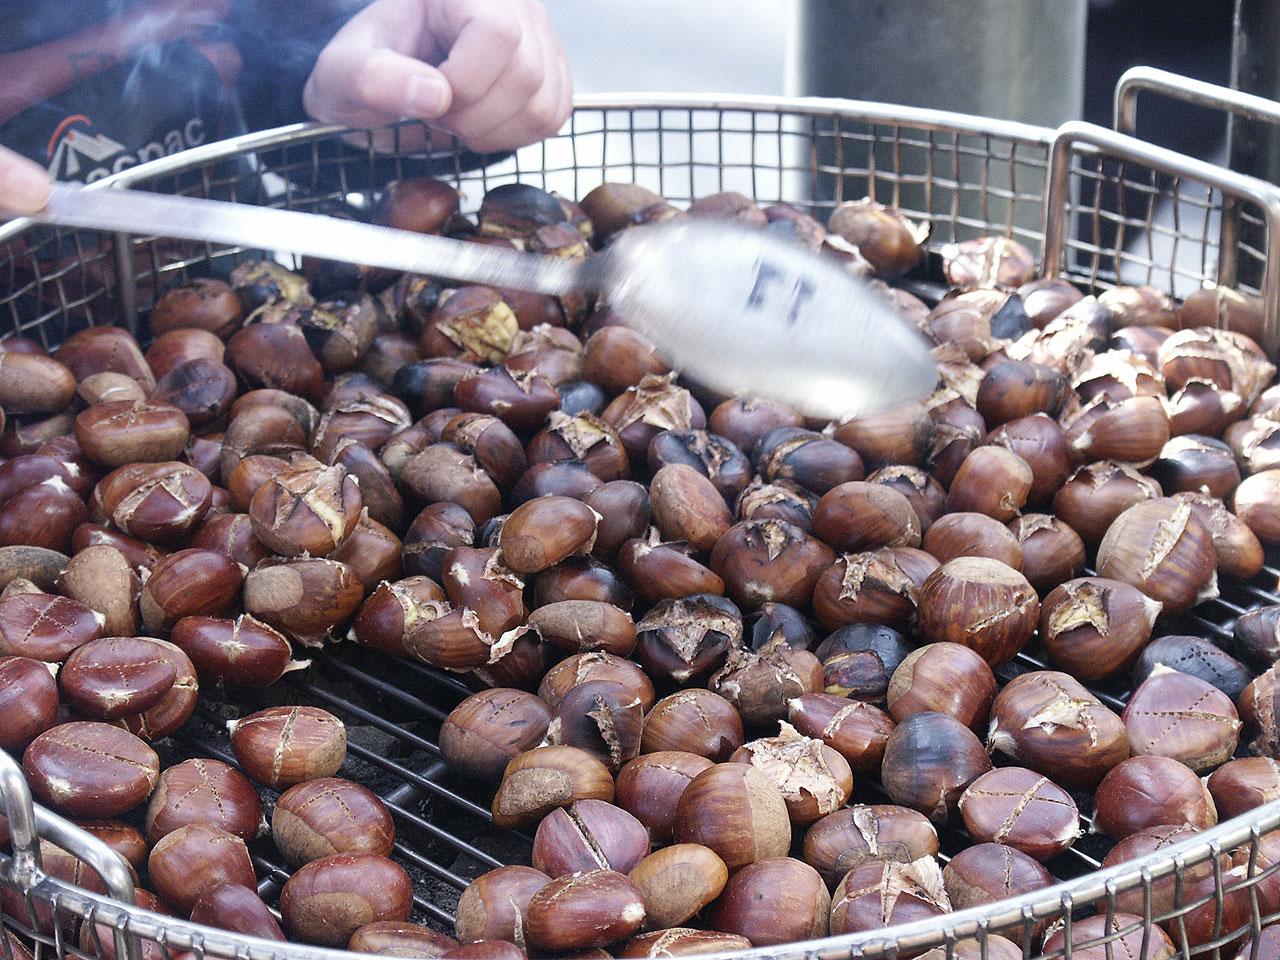 File:Chestnuts roasted.jpg - Wikipedia